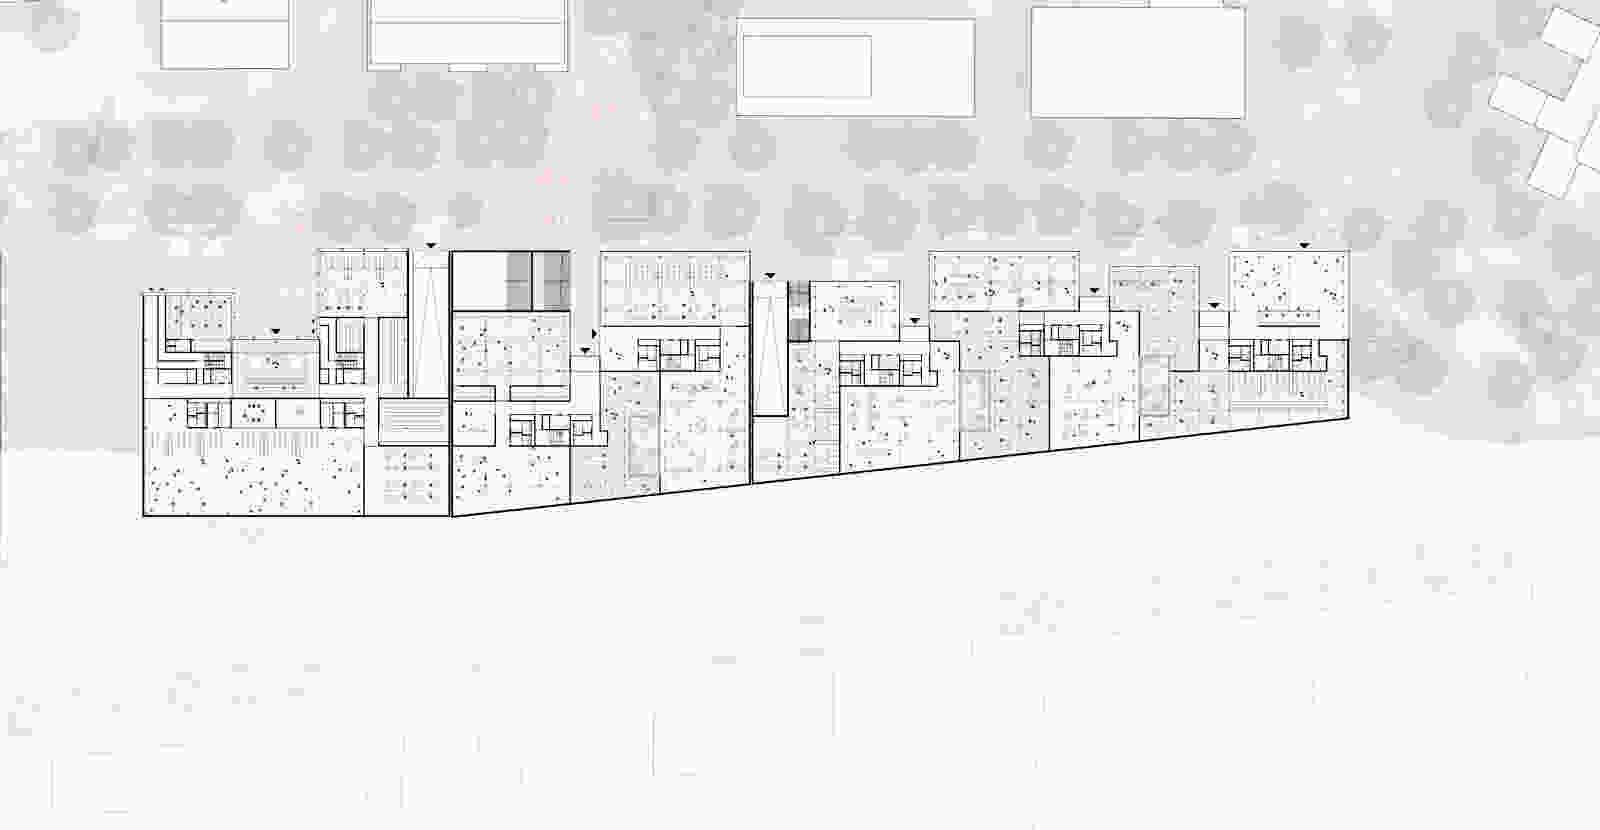 491 dmaa Gasstrasse plan level 00